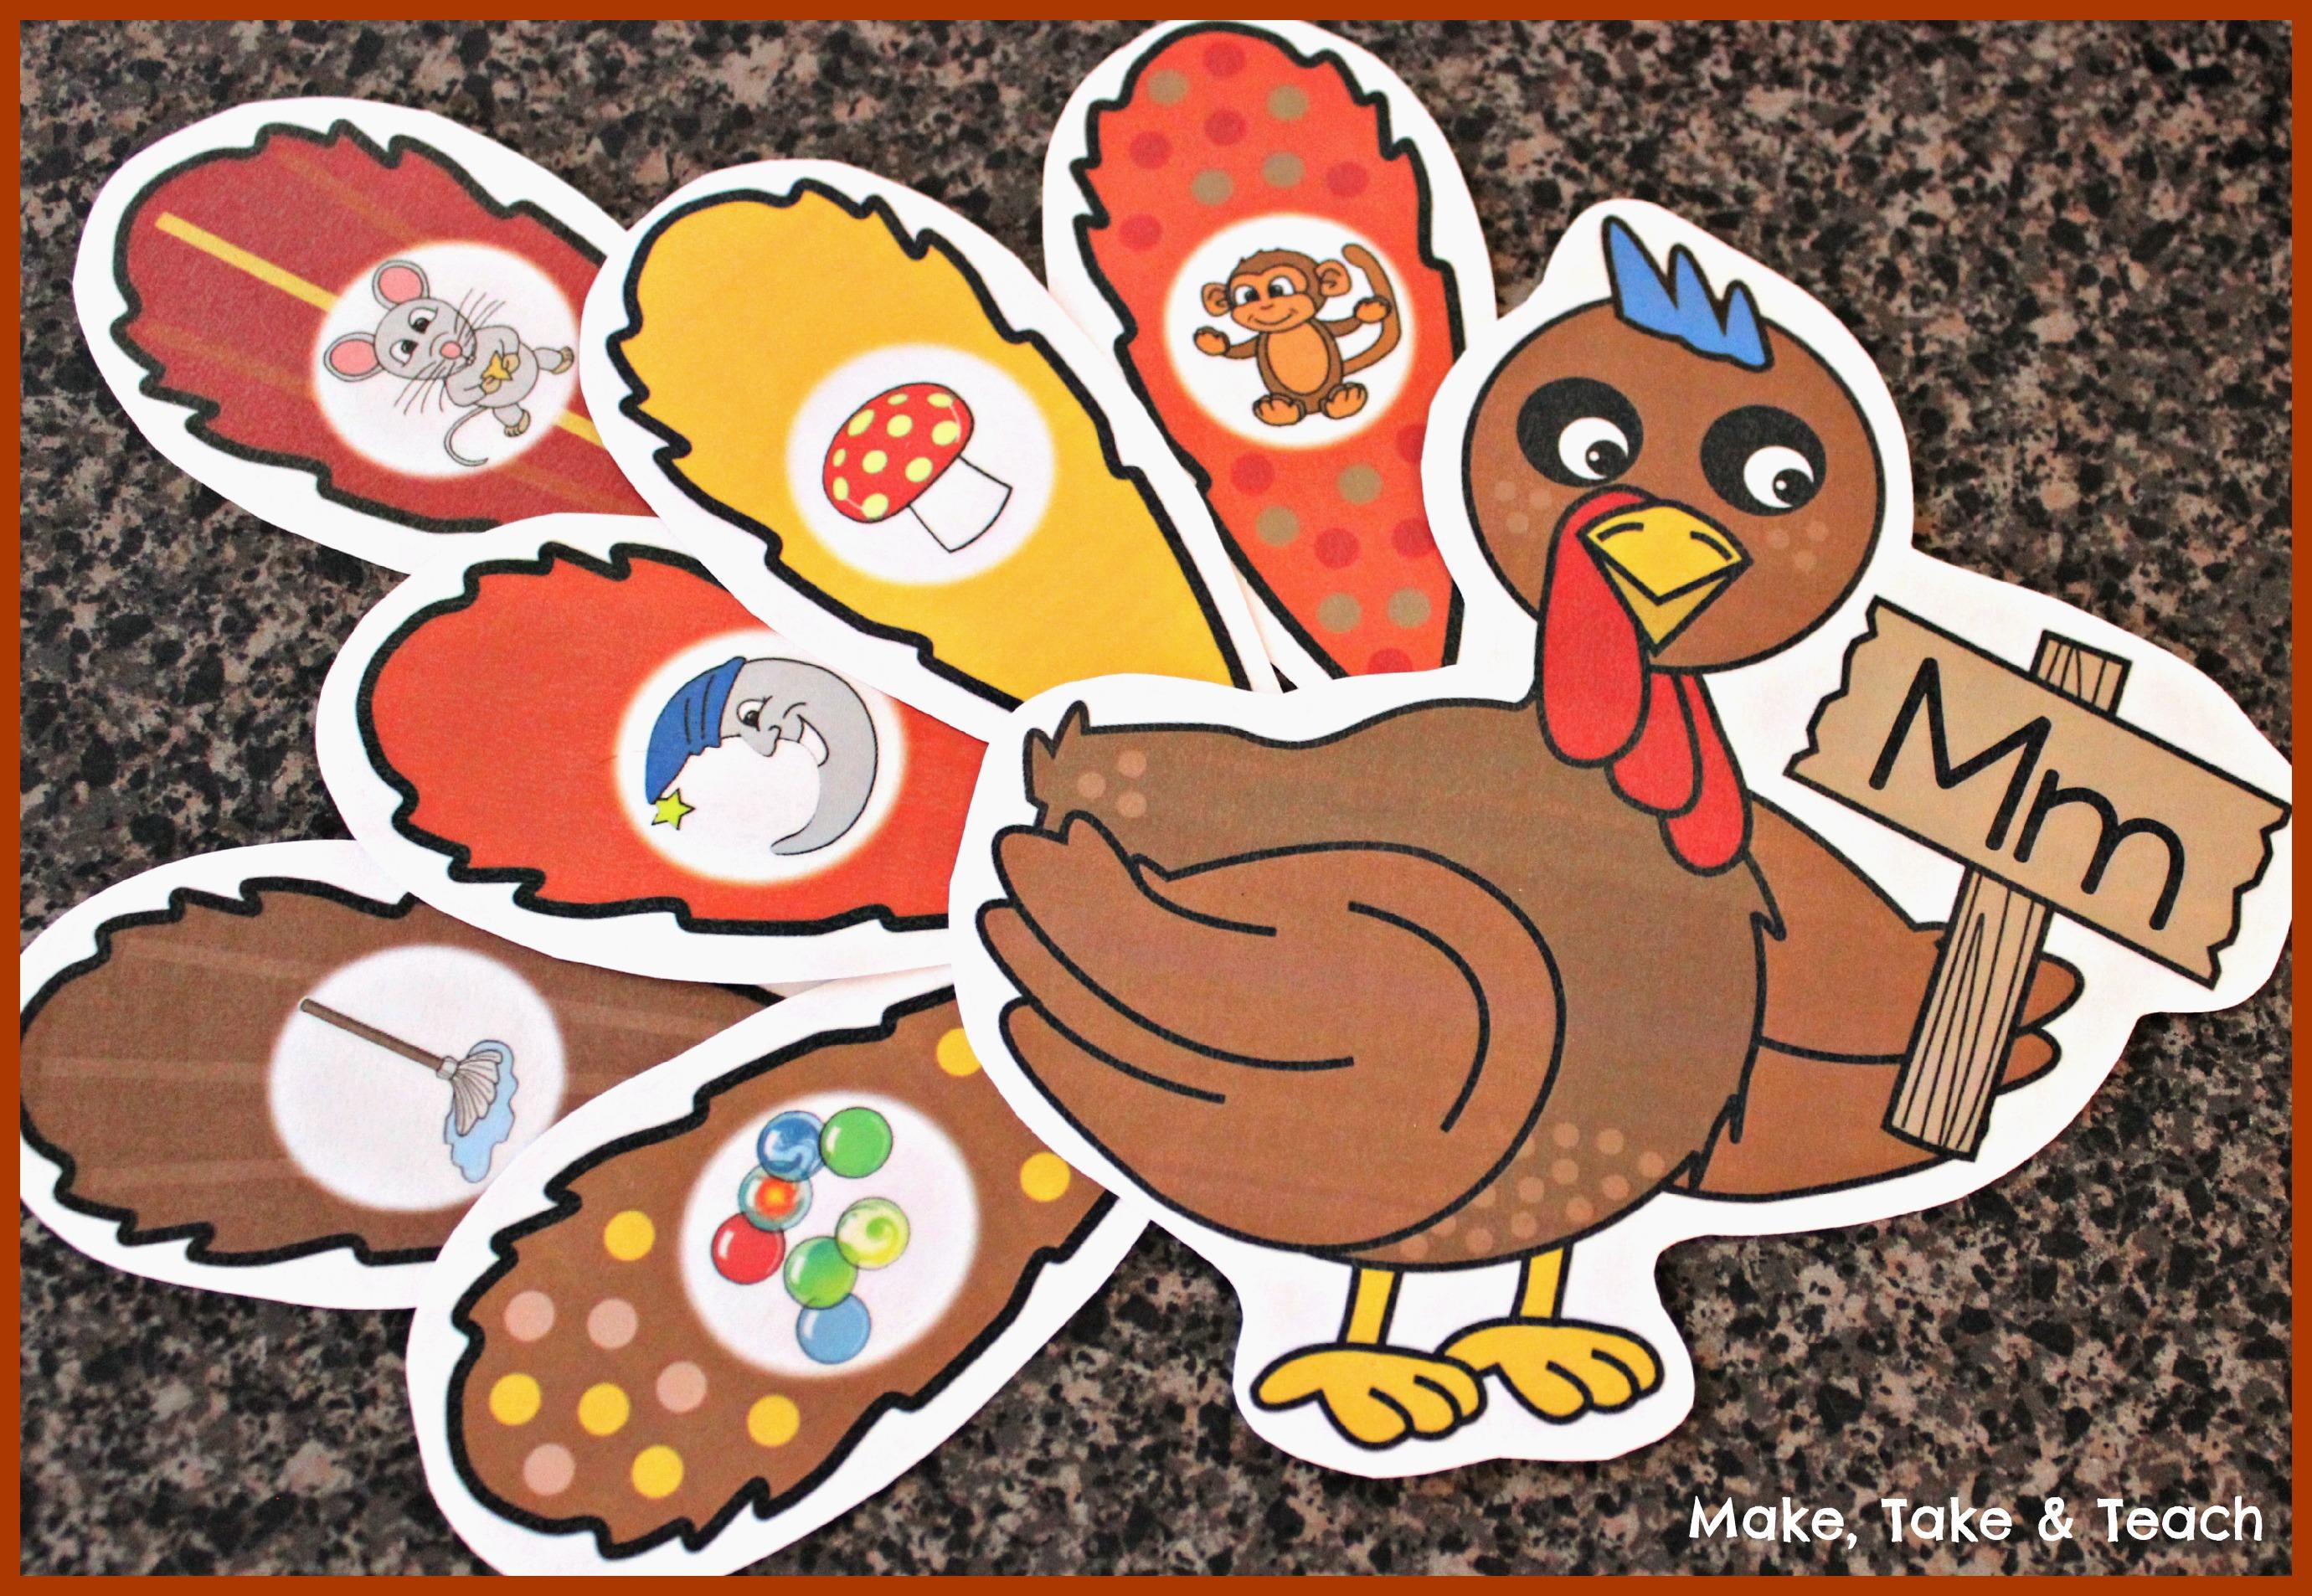 TurkeyAlphaborder